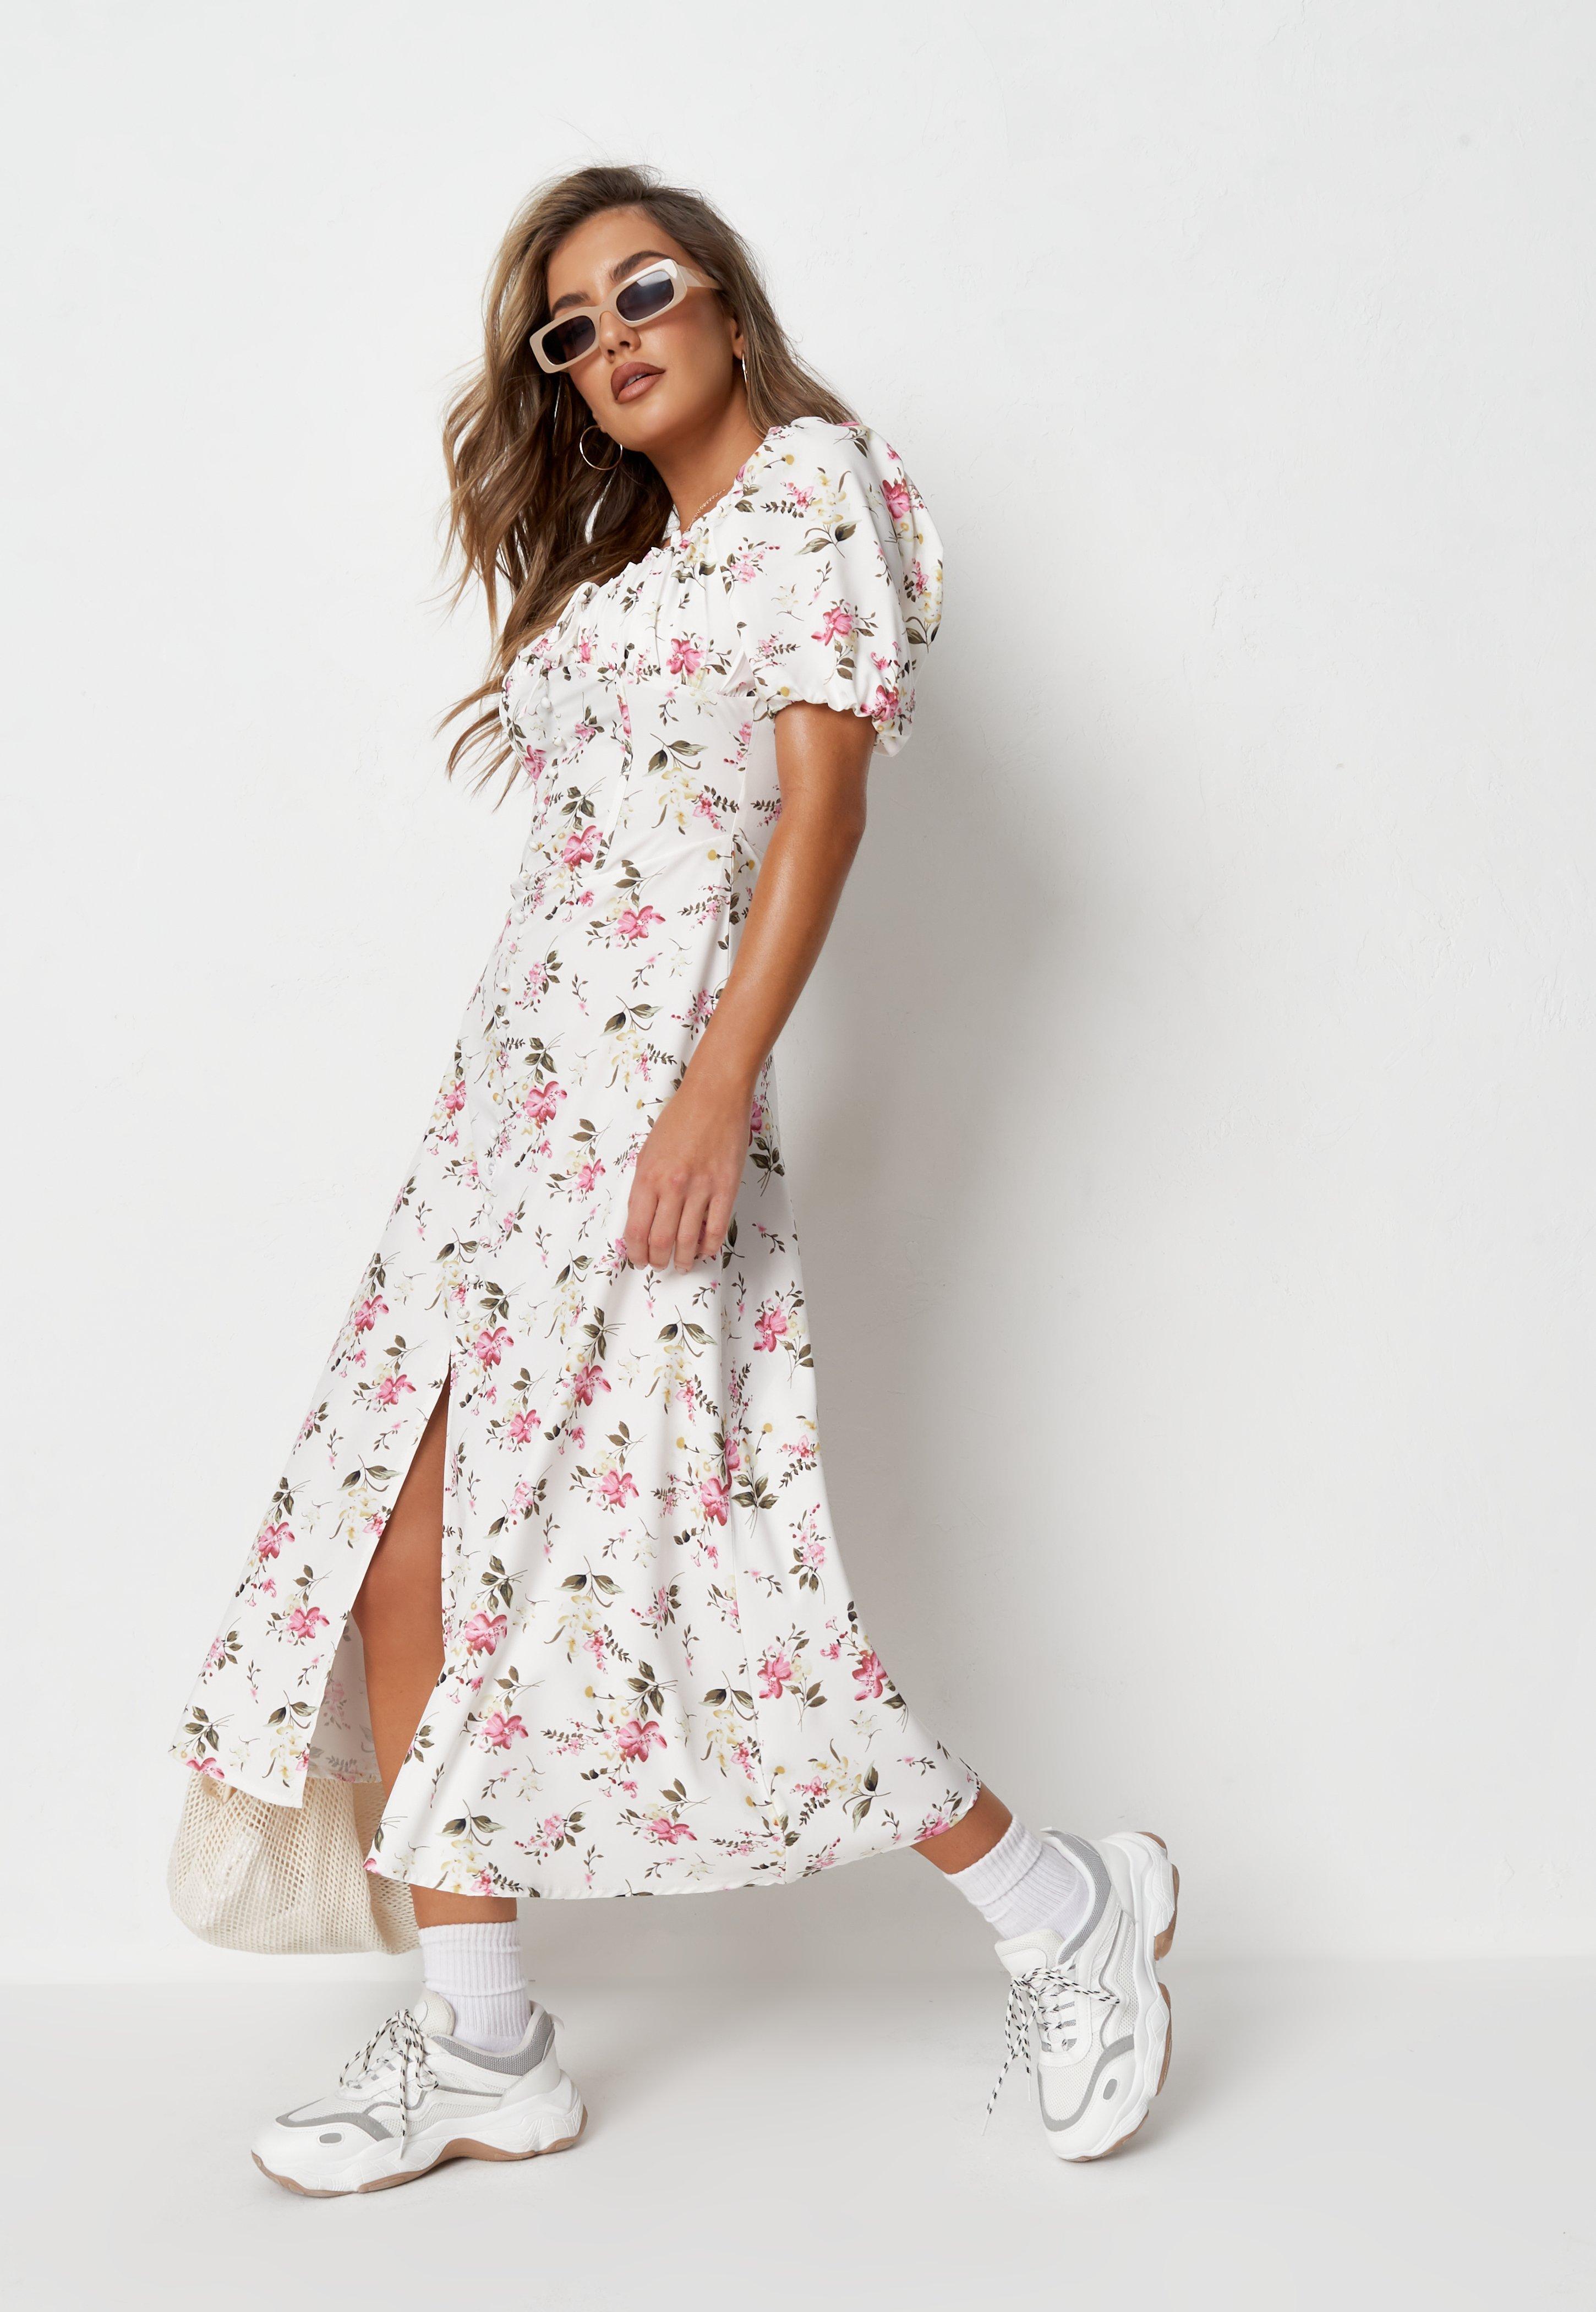 Geblumtes Kleid Blumenkleider Online Shoppen Missguided De